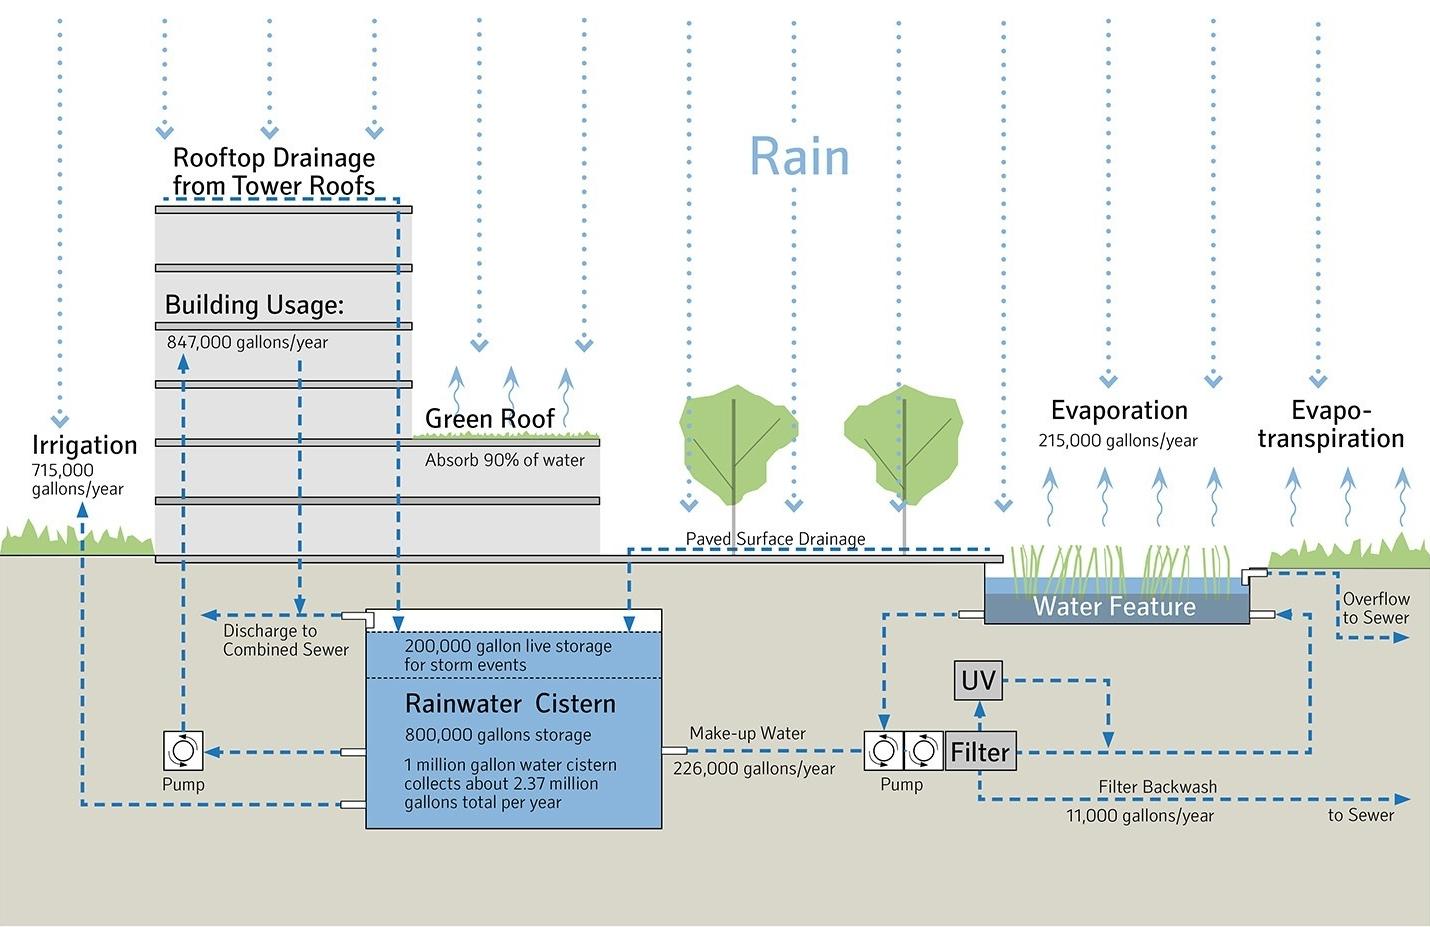 Figure 6. Rainwater system. Courtesy of NBBJ.